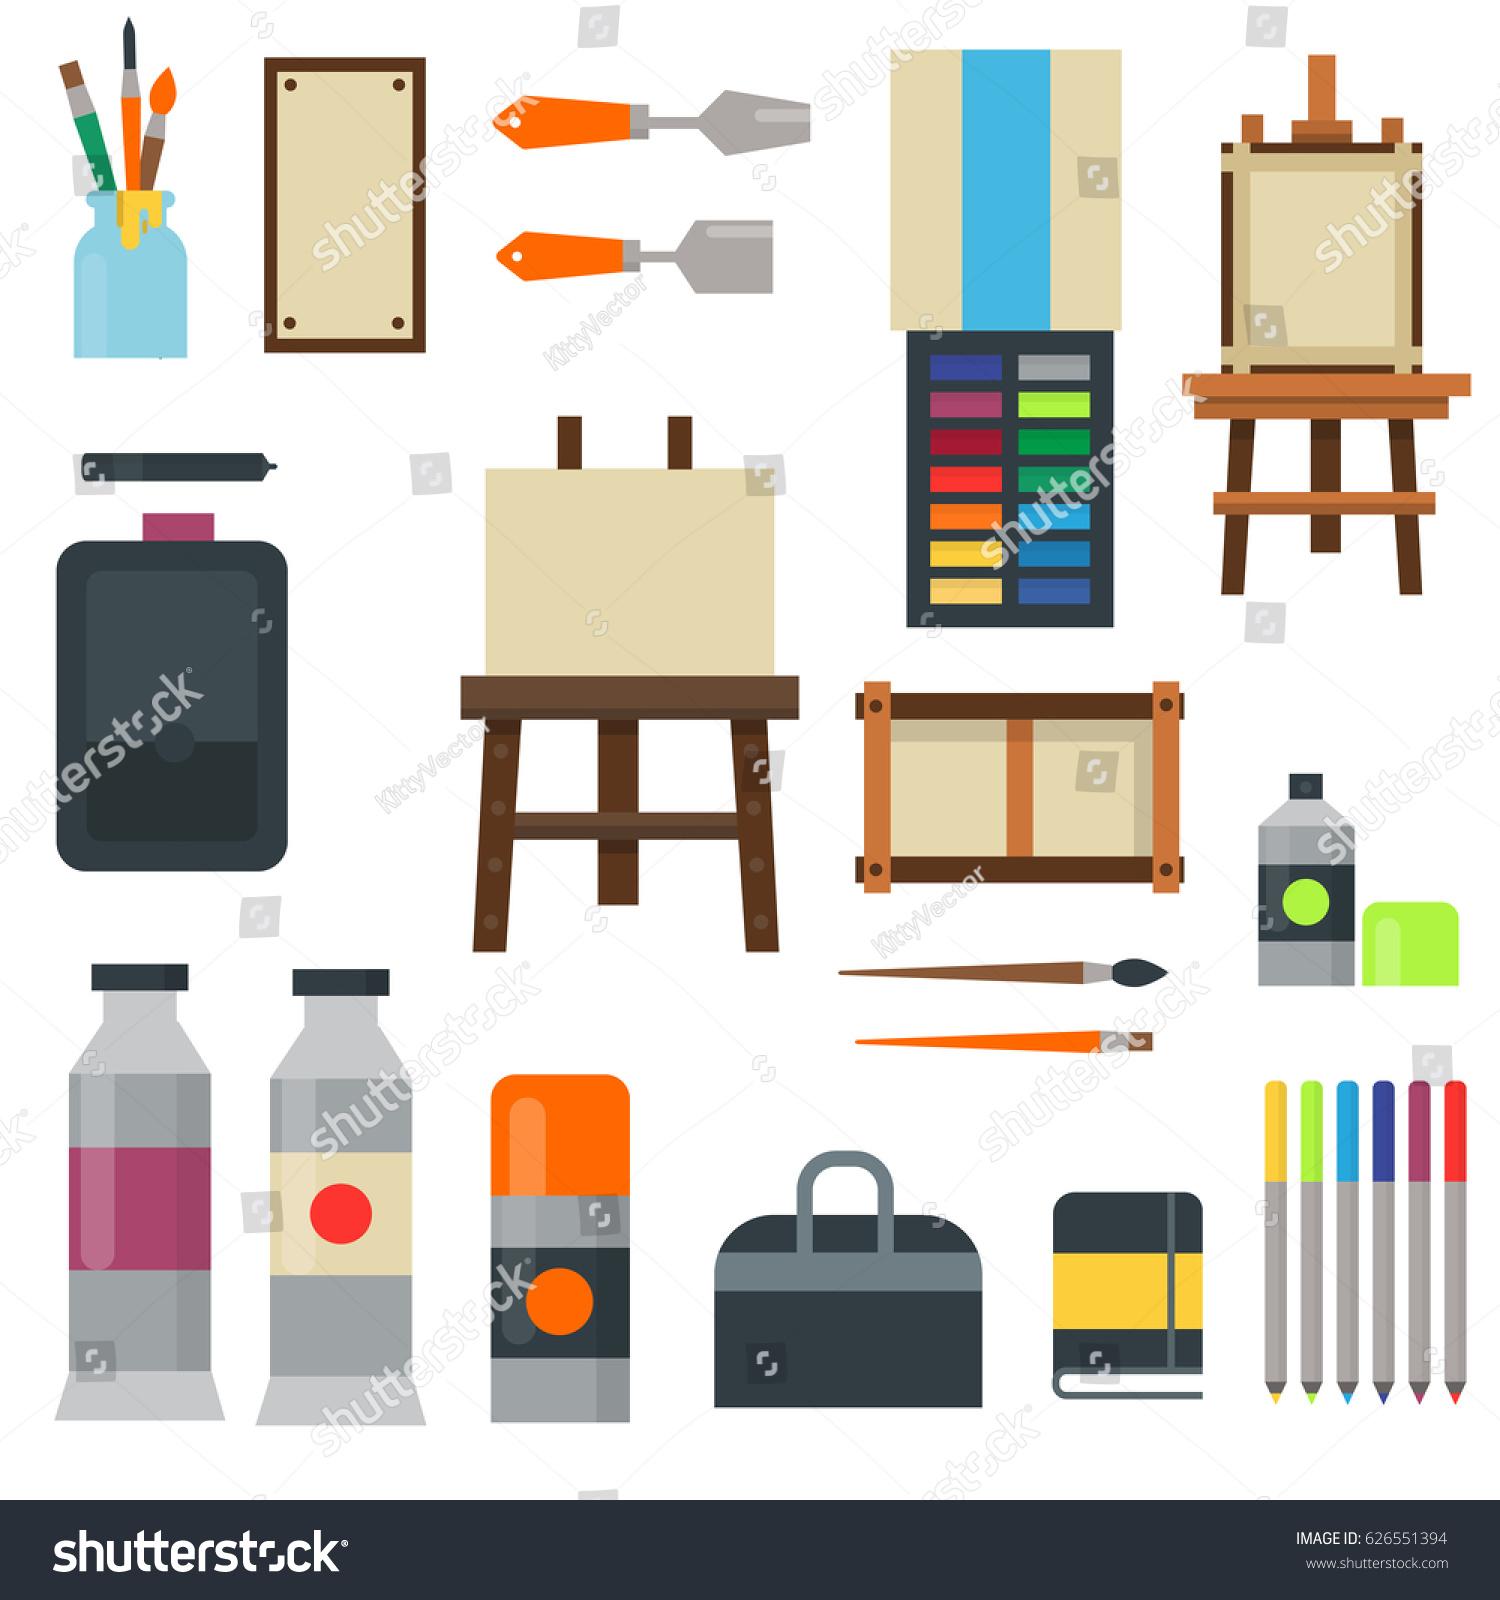 Creative Furniture Icons Set Flat Design House Tools And Furniture